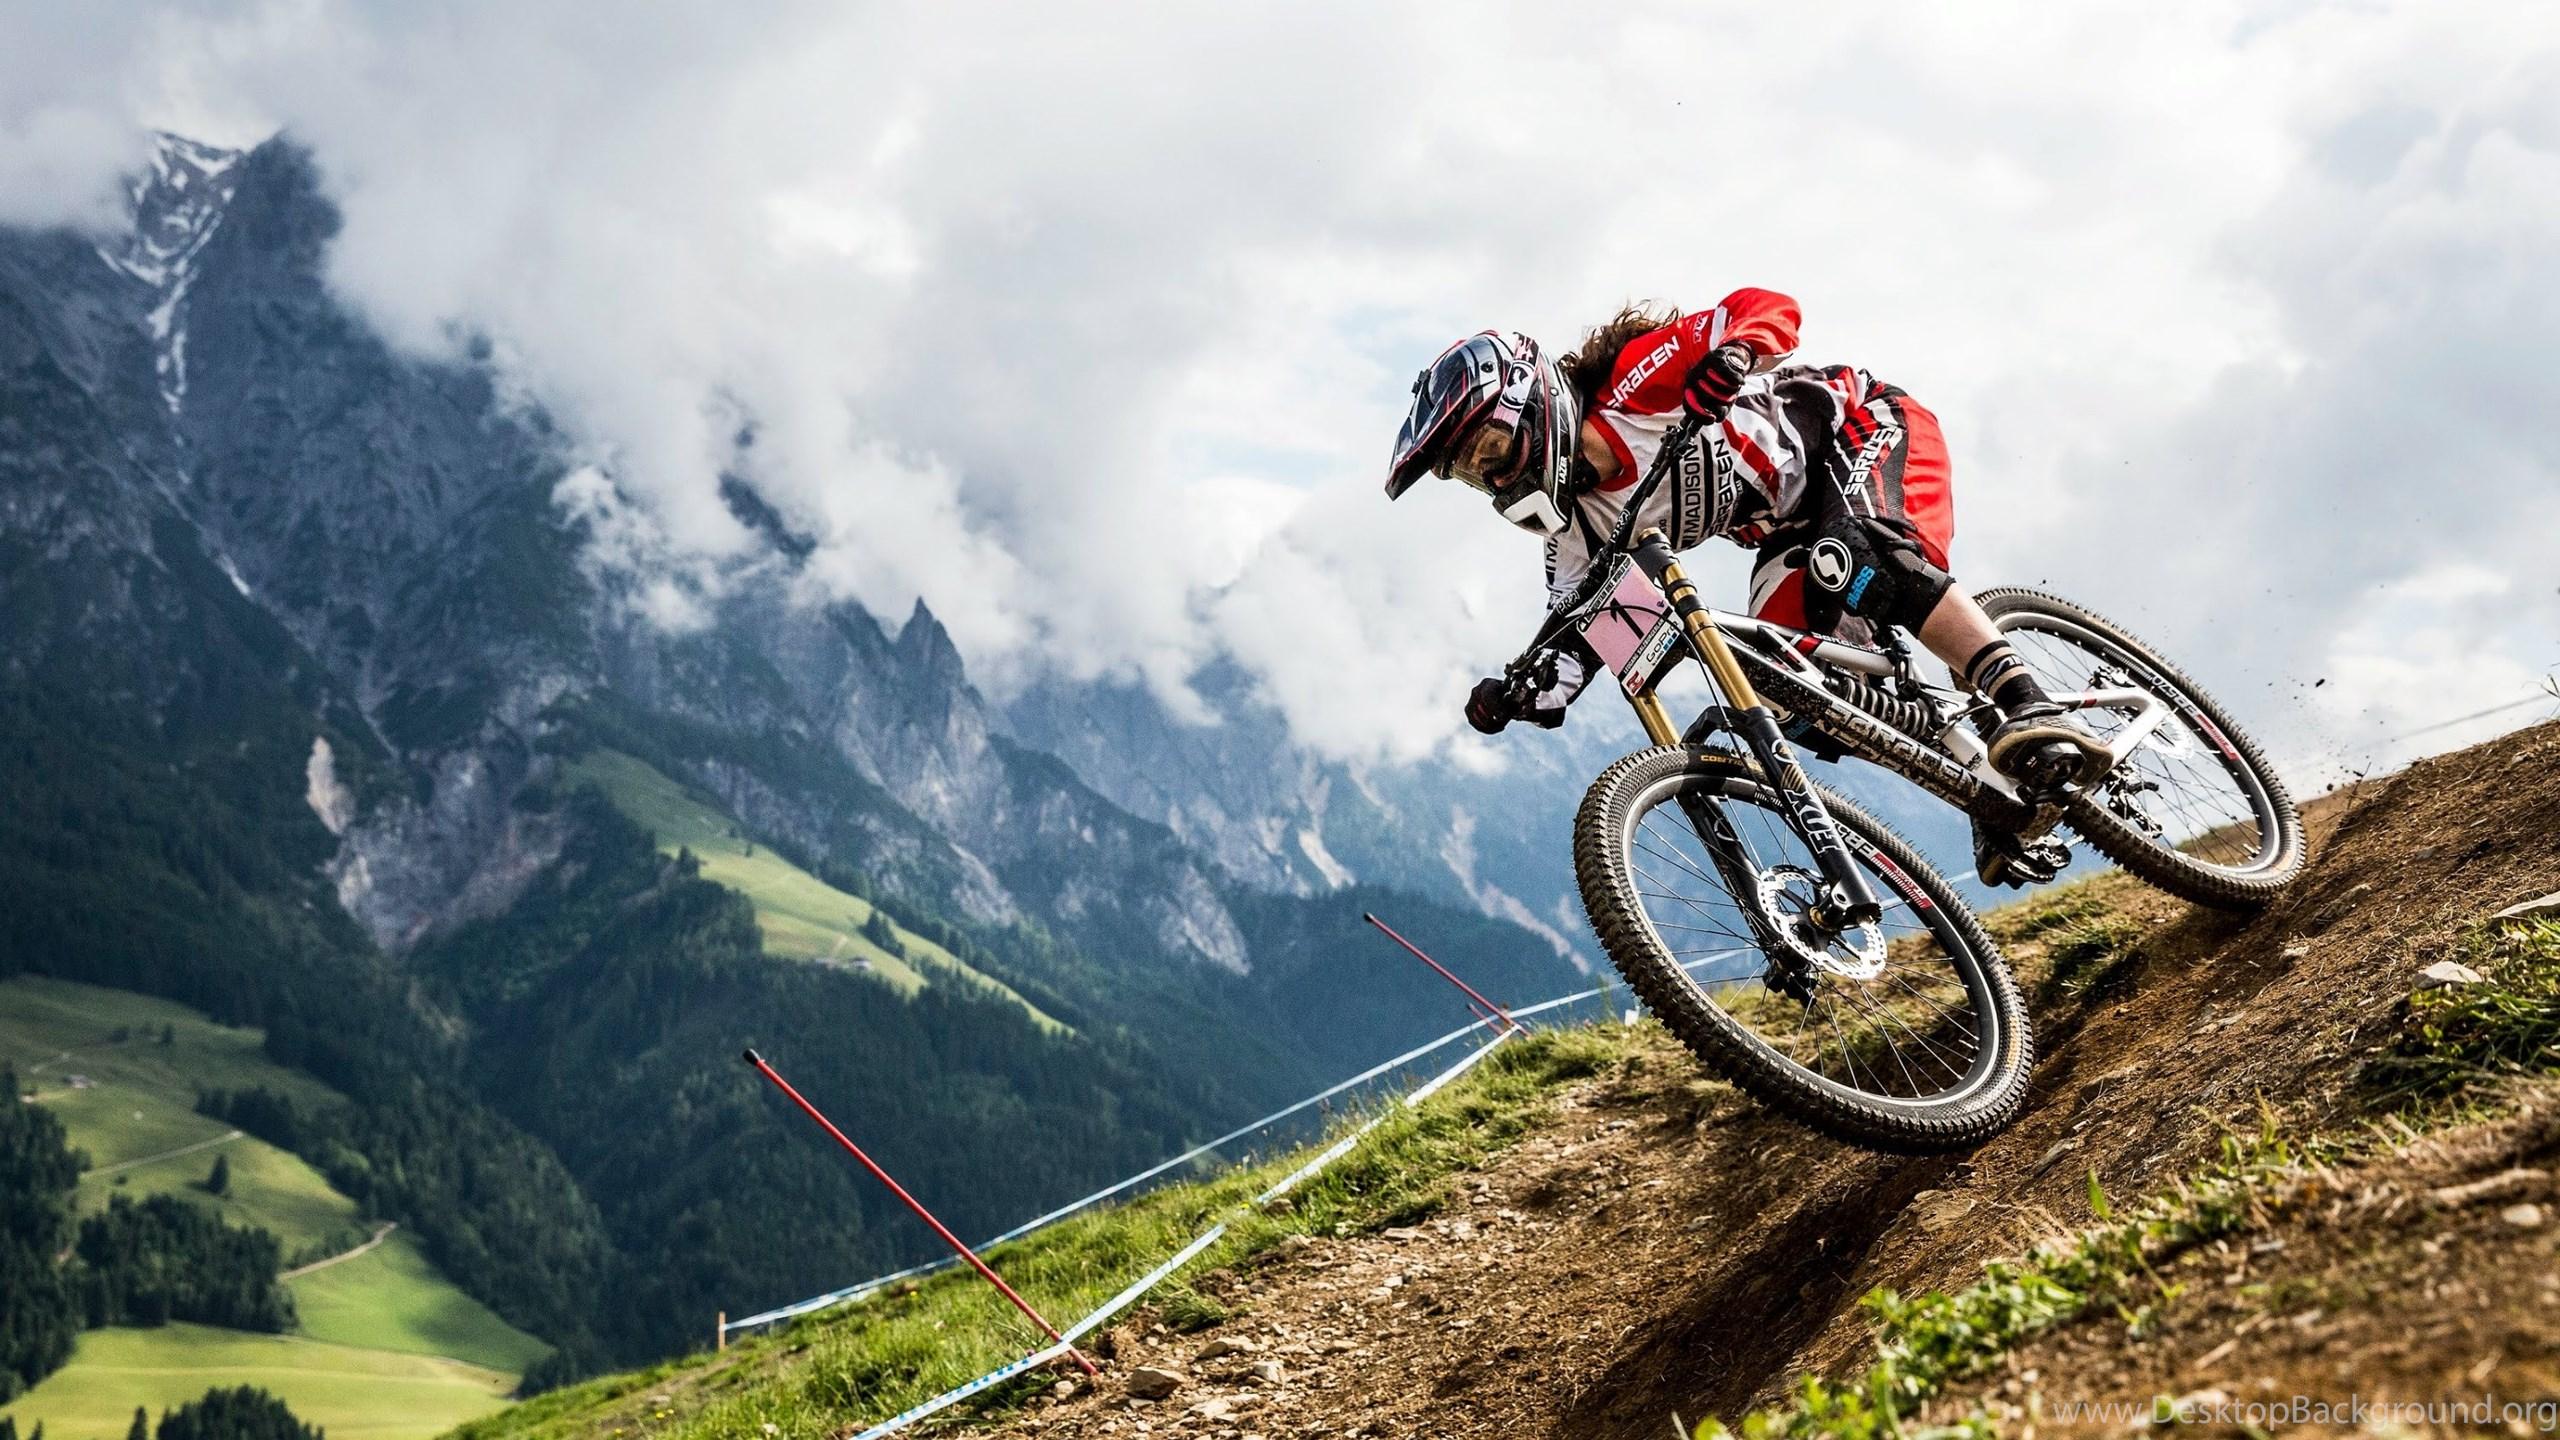 Mountain Bike Downhill Wallpapers HD Free Desktop Backgrounds 2016